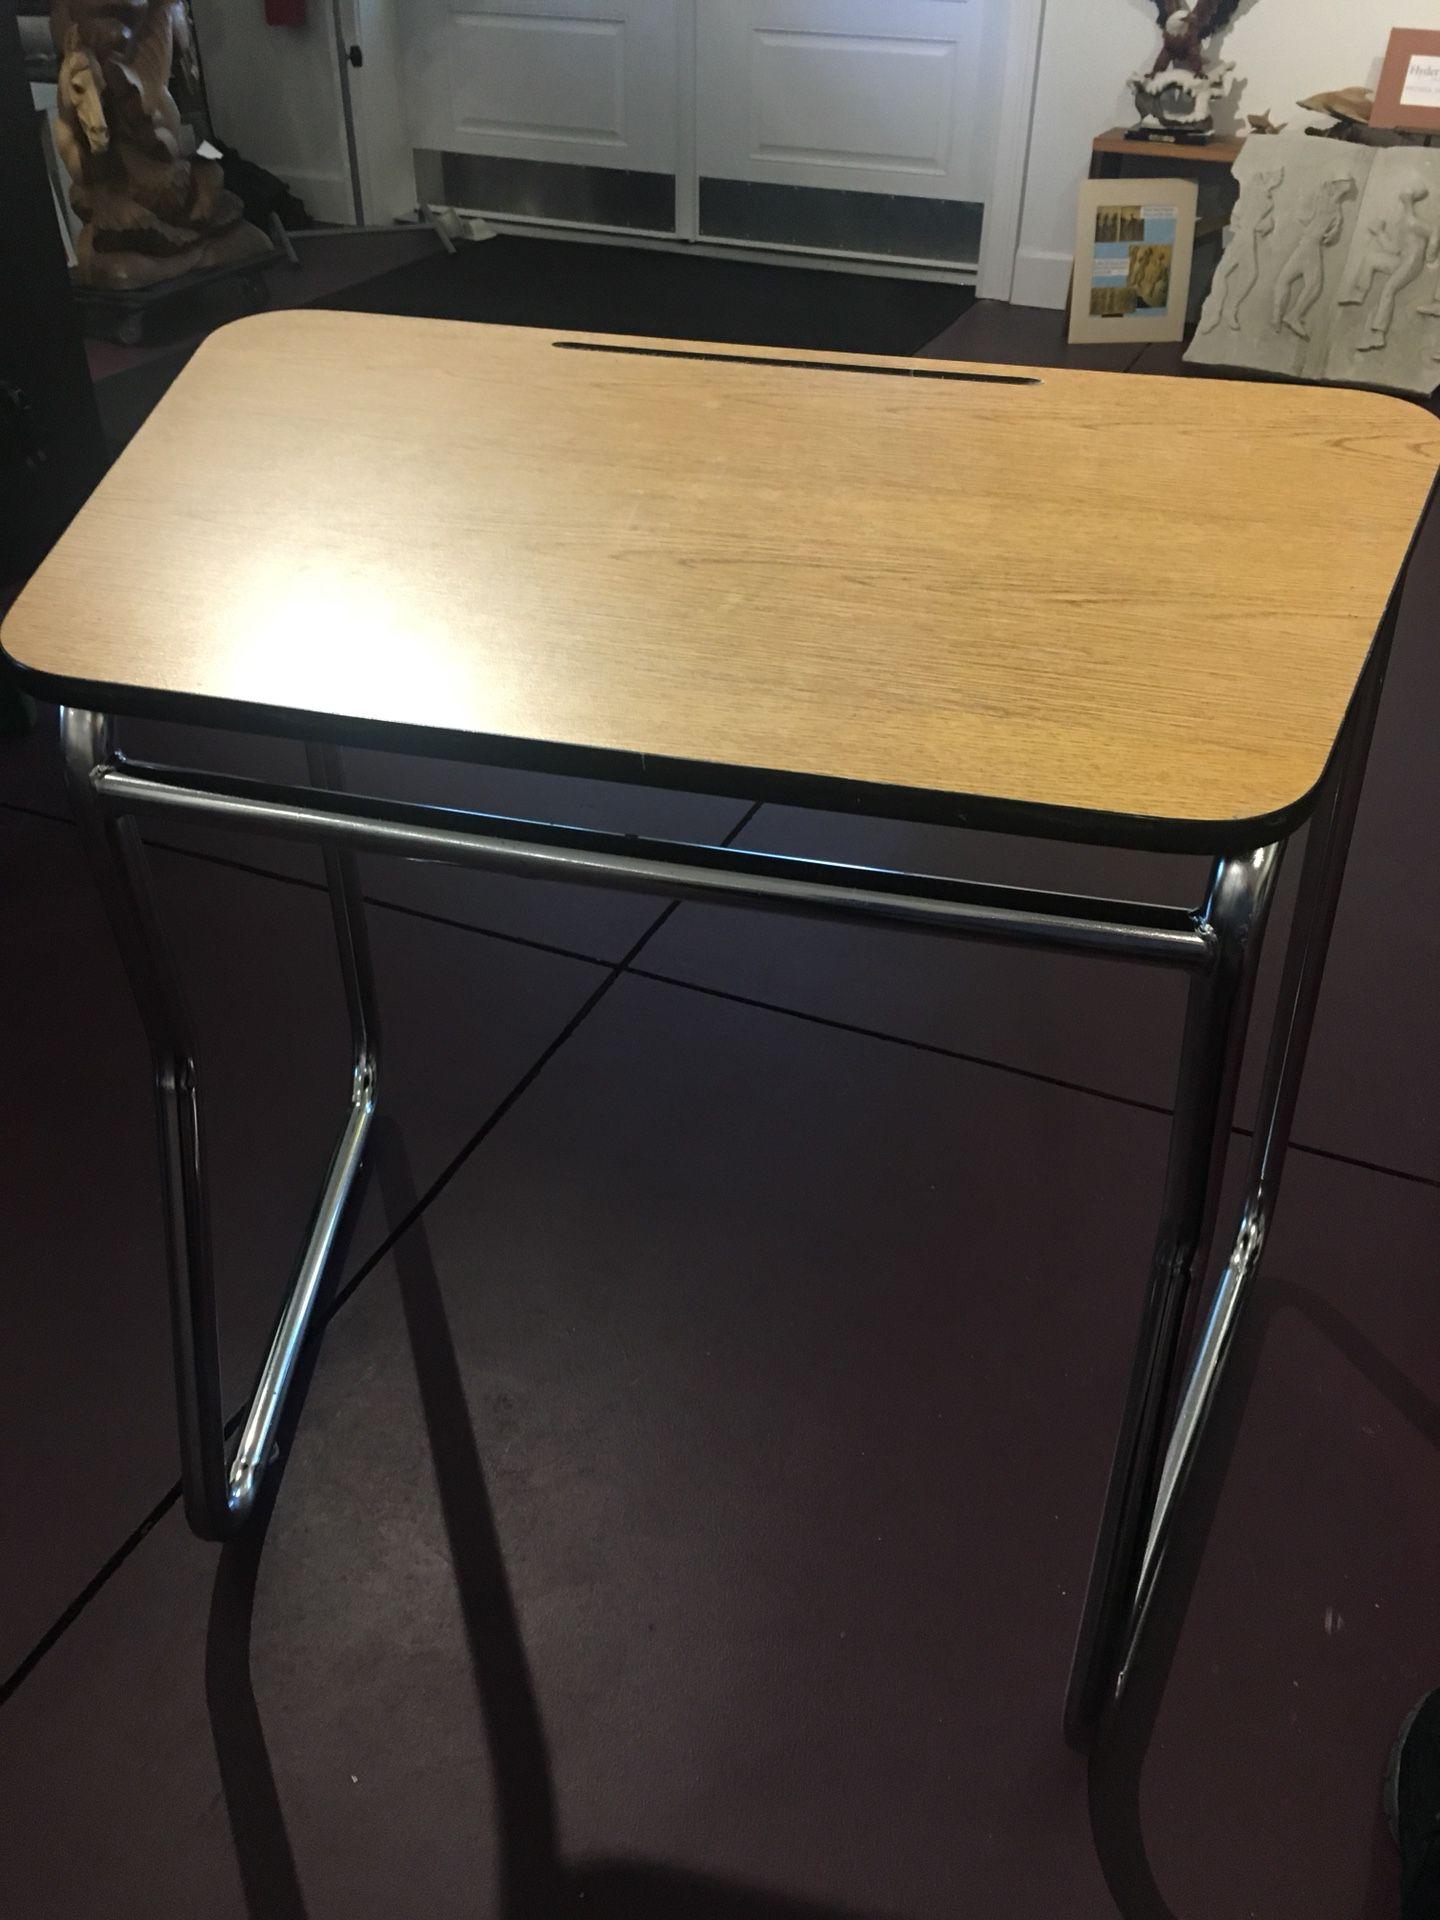 10 Slanted Art Studio Desk's adult size